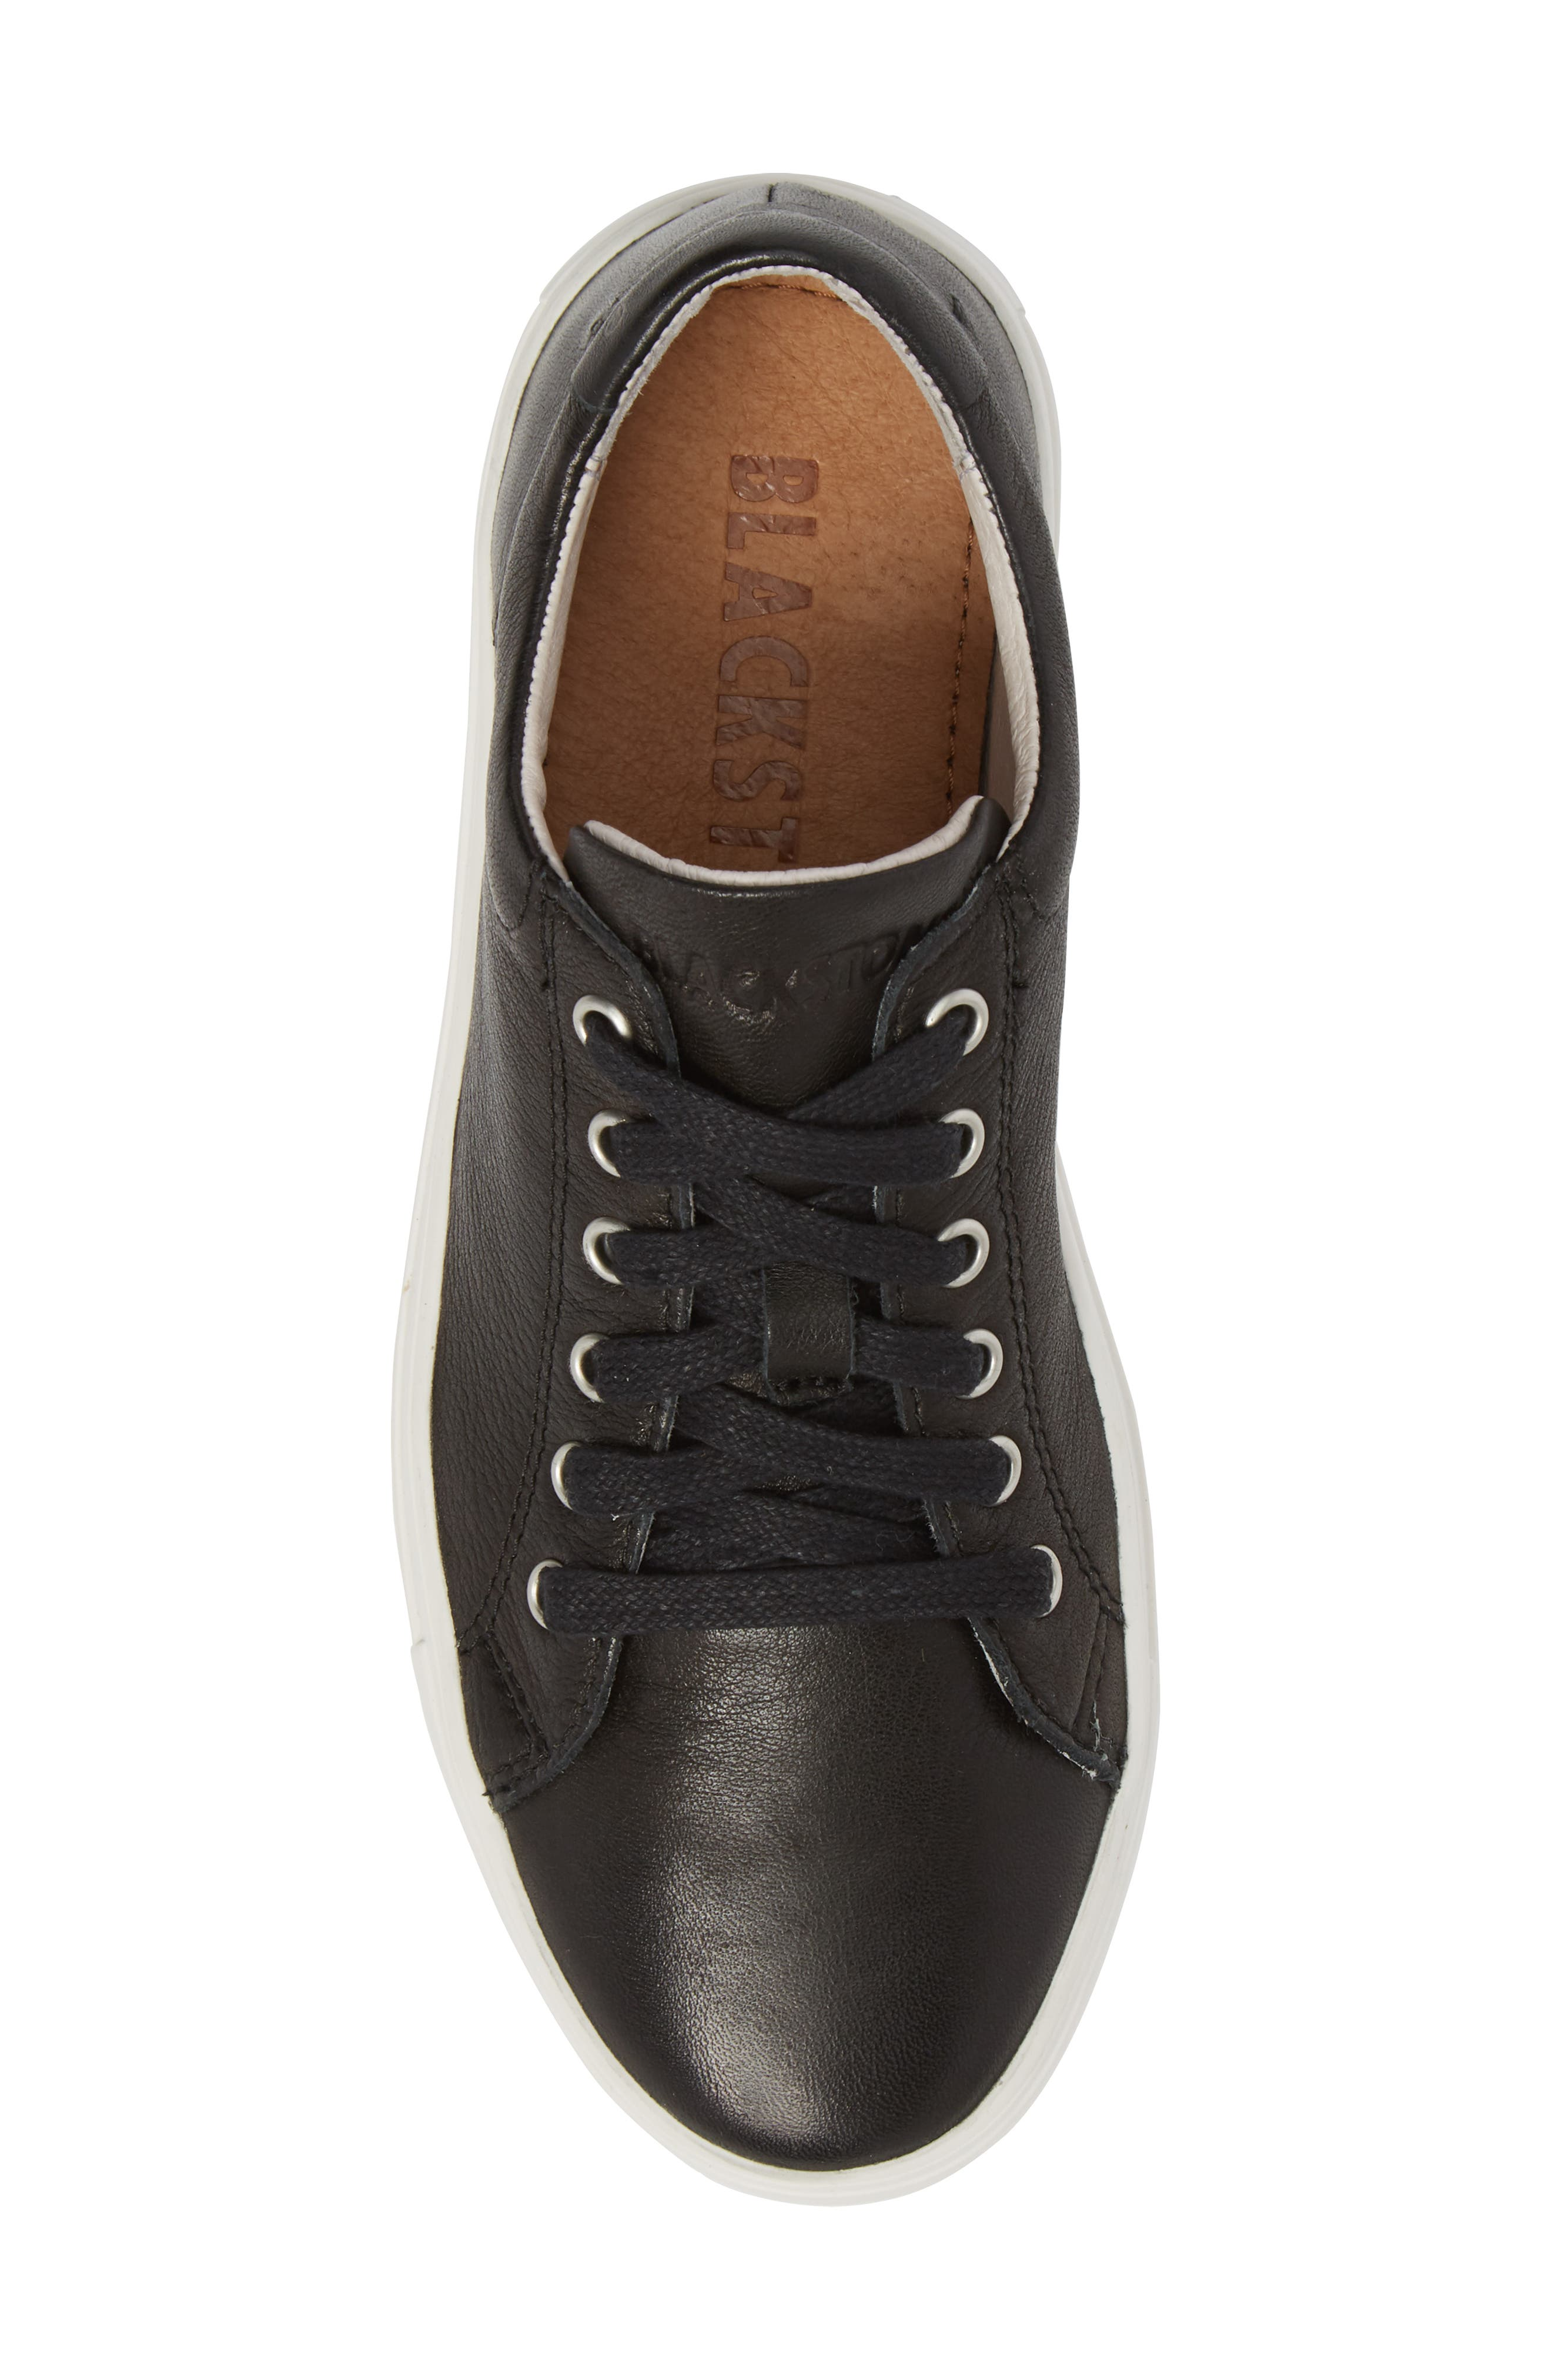 PL71 Low Top Sneaker,                             Alternate thumbnail 5, color,                             BLACK LEATHER